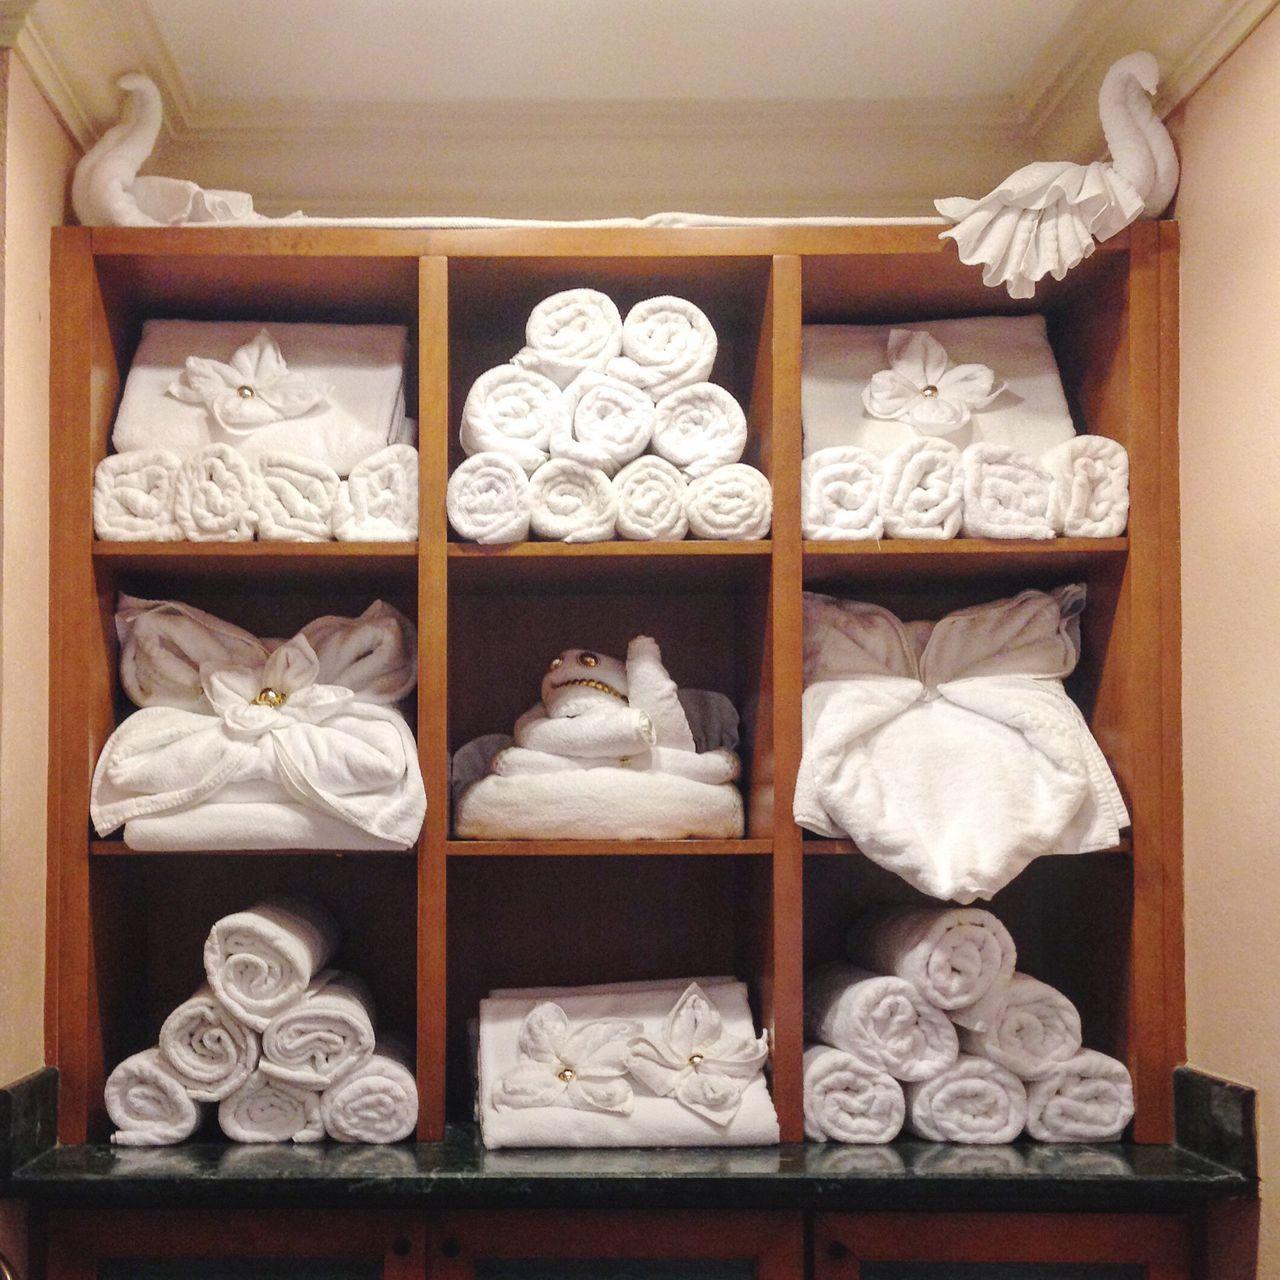 Beautifully Organized Towels Towel Animal Nassau, Bahamas Vacation